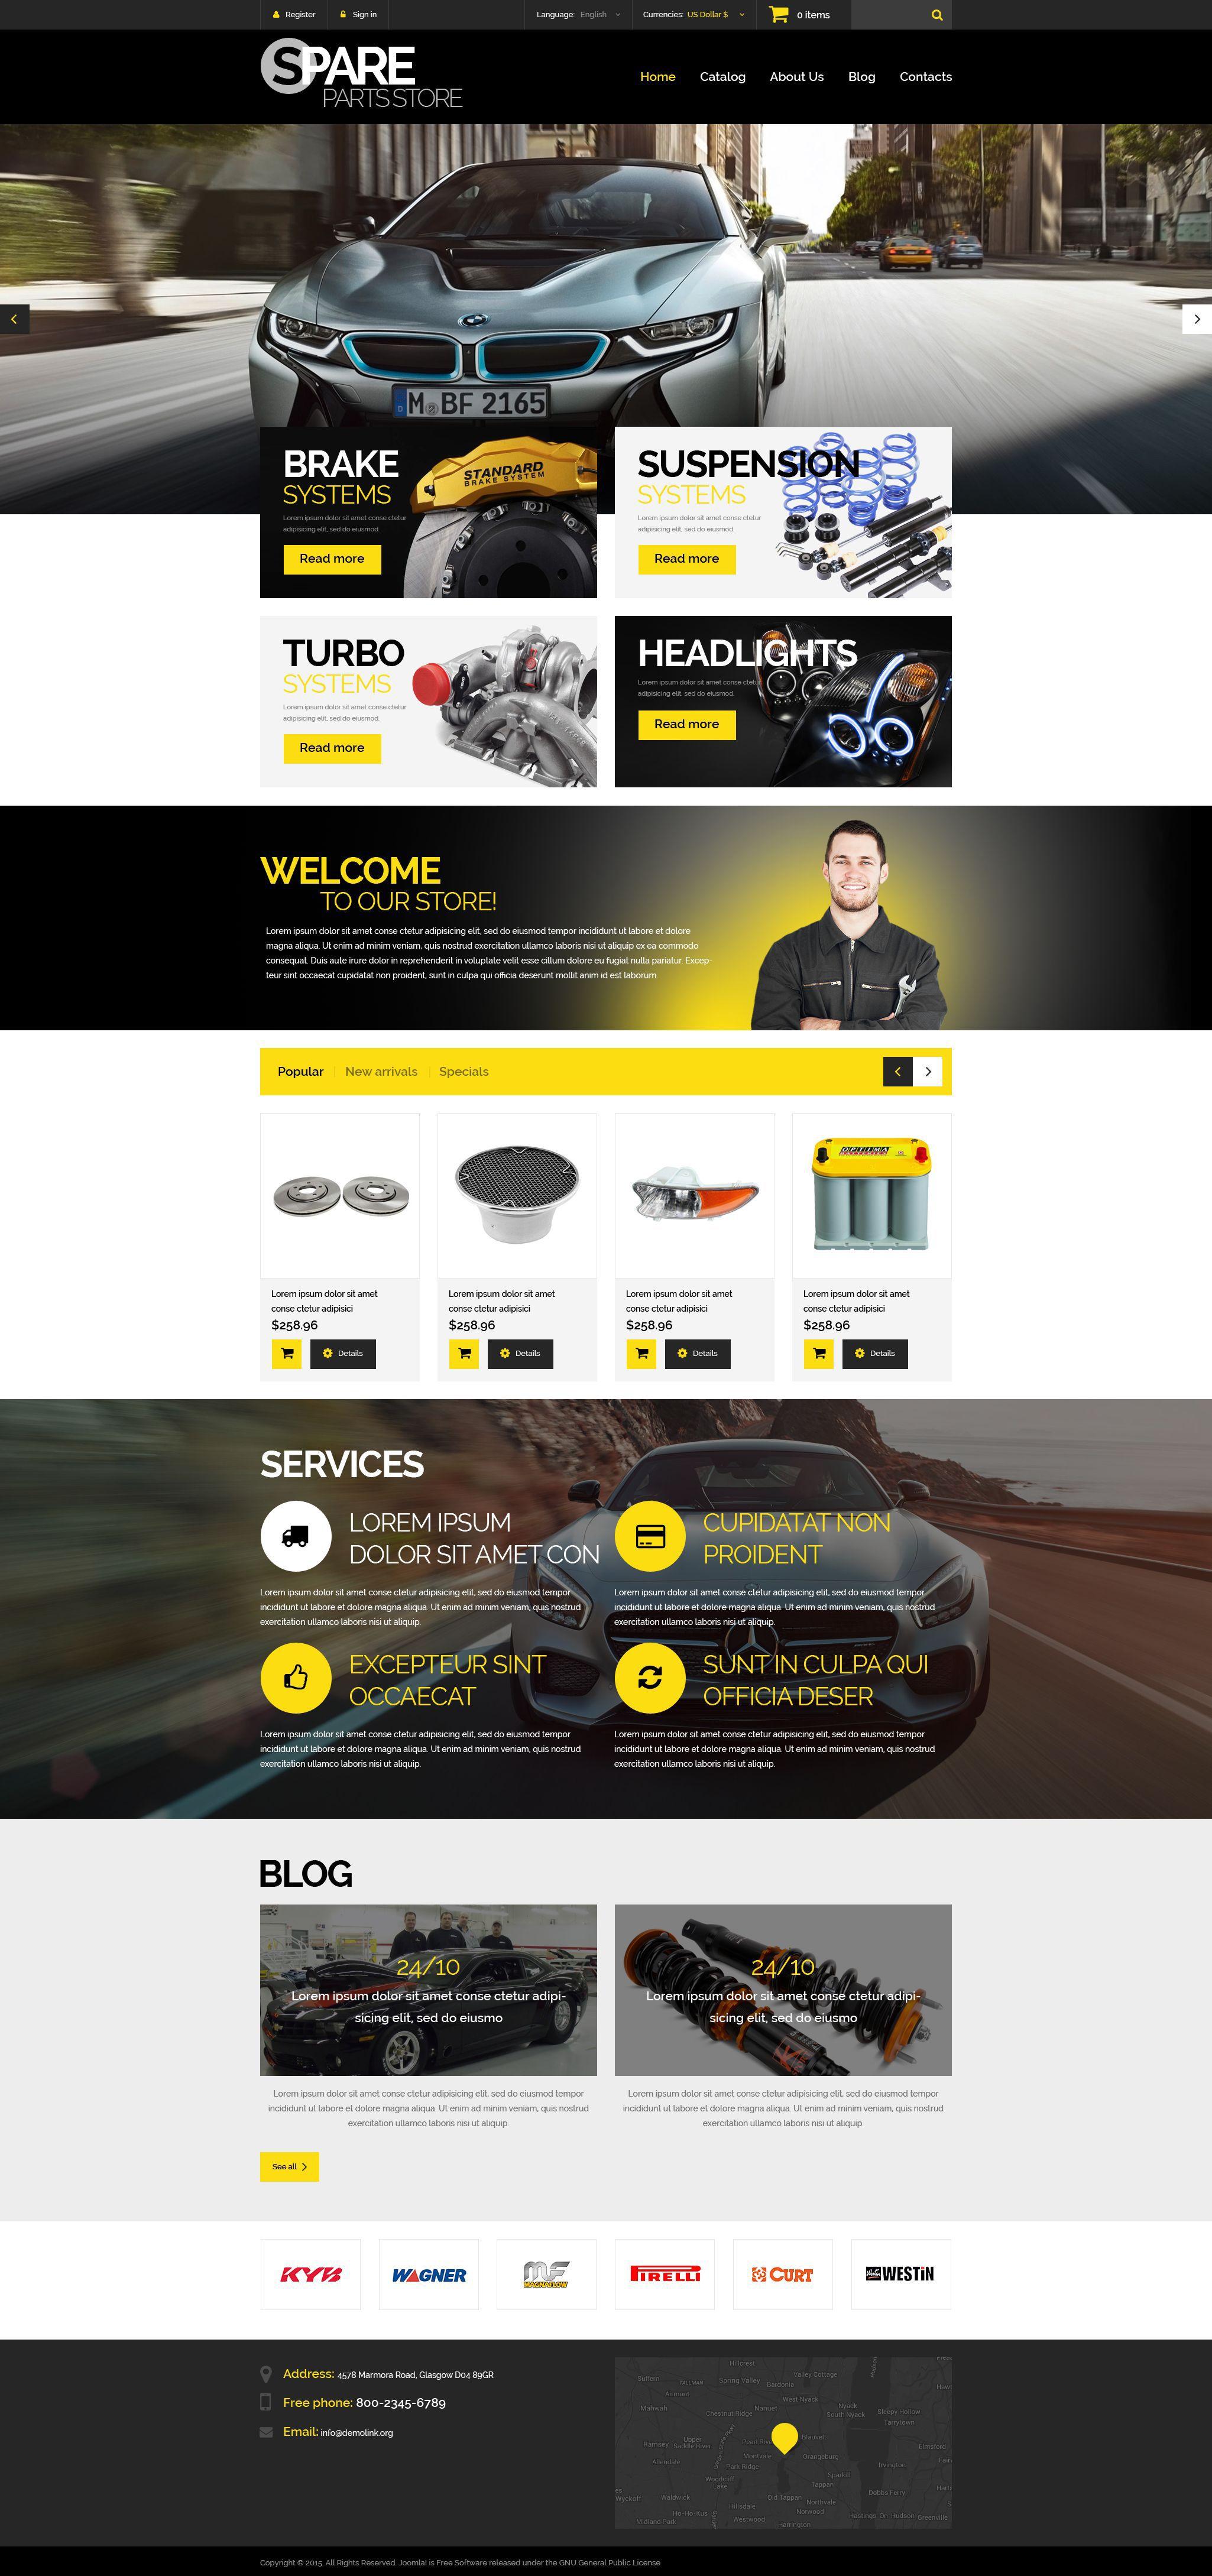 Spare Parts Store Theme Web design, Design